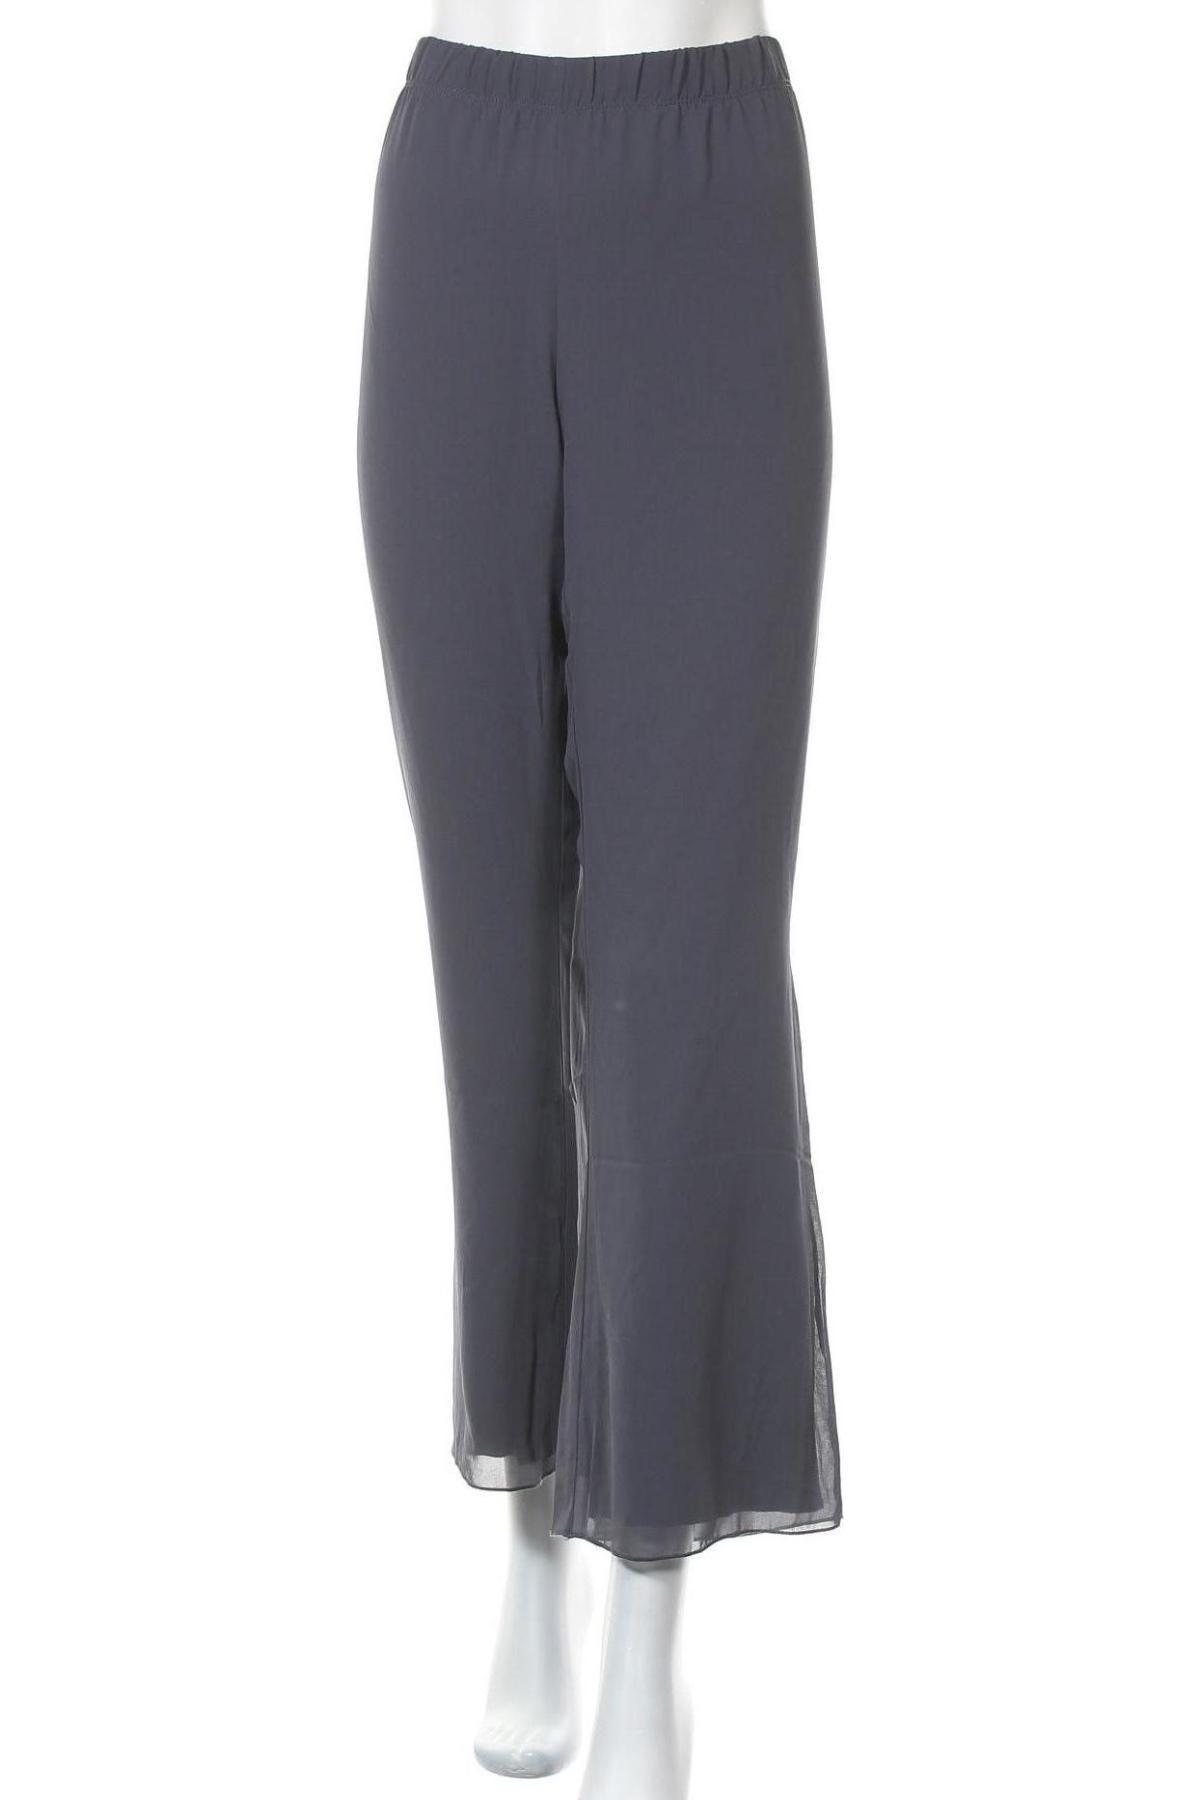 Дамски панталон Myrine, Размер XXL, Цвят Син, 100% полиестер, Цена 31,00лв.